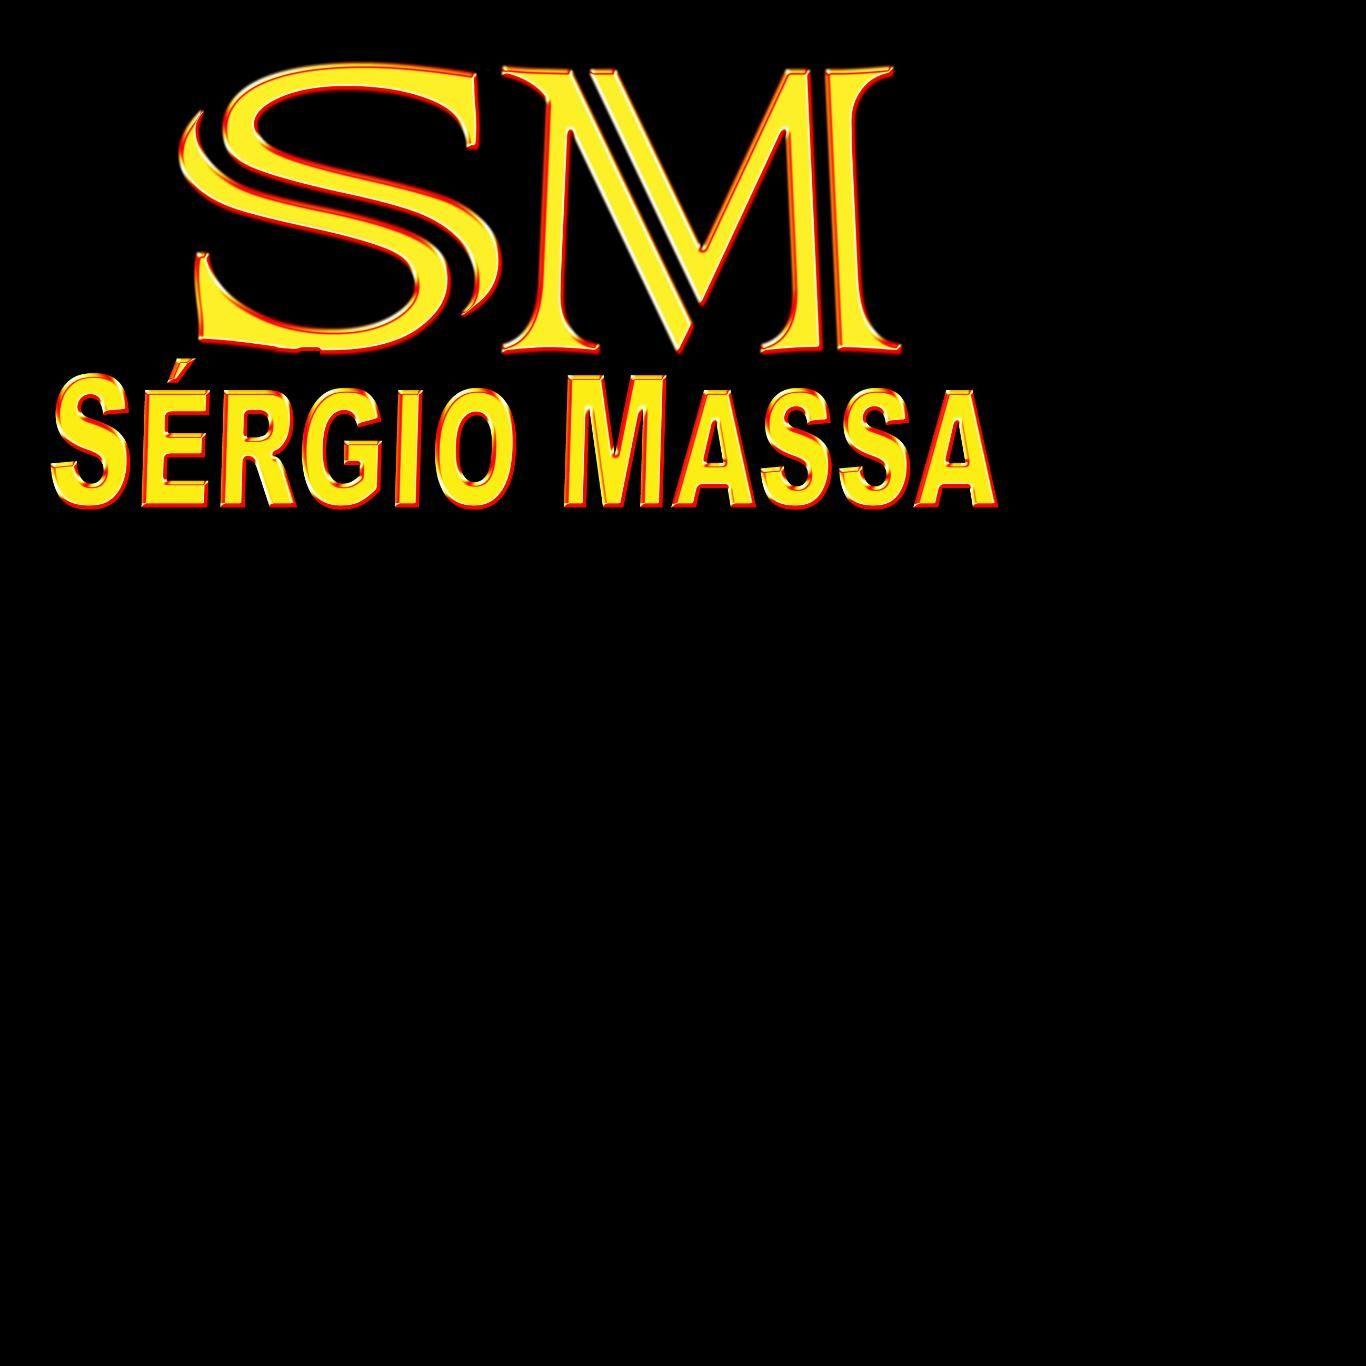 SM_PRODUÇÕES SERGIO MASSA